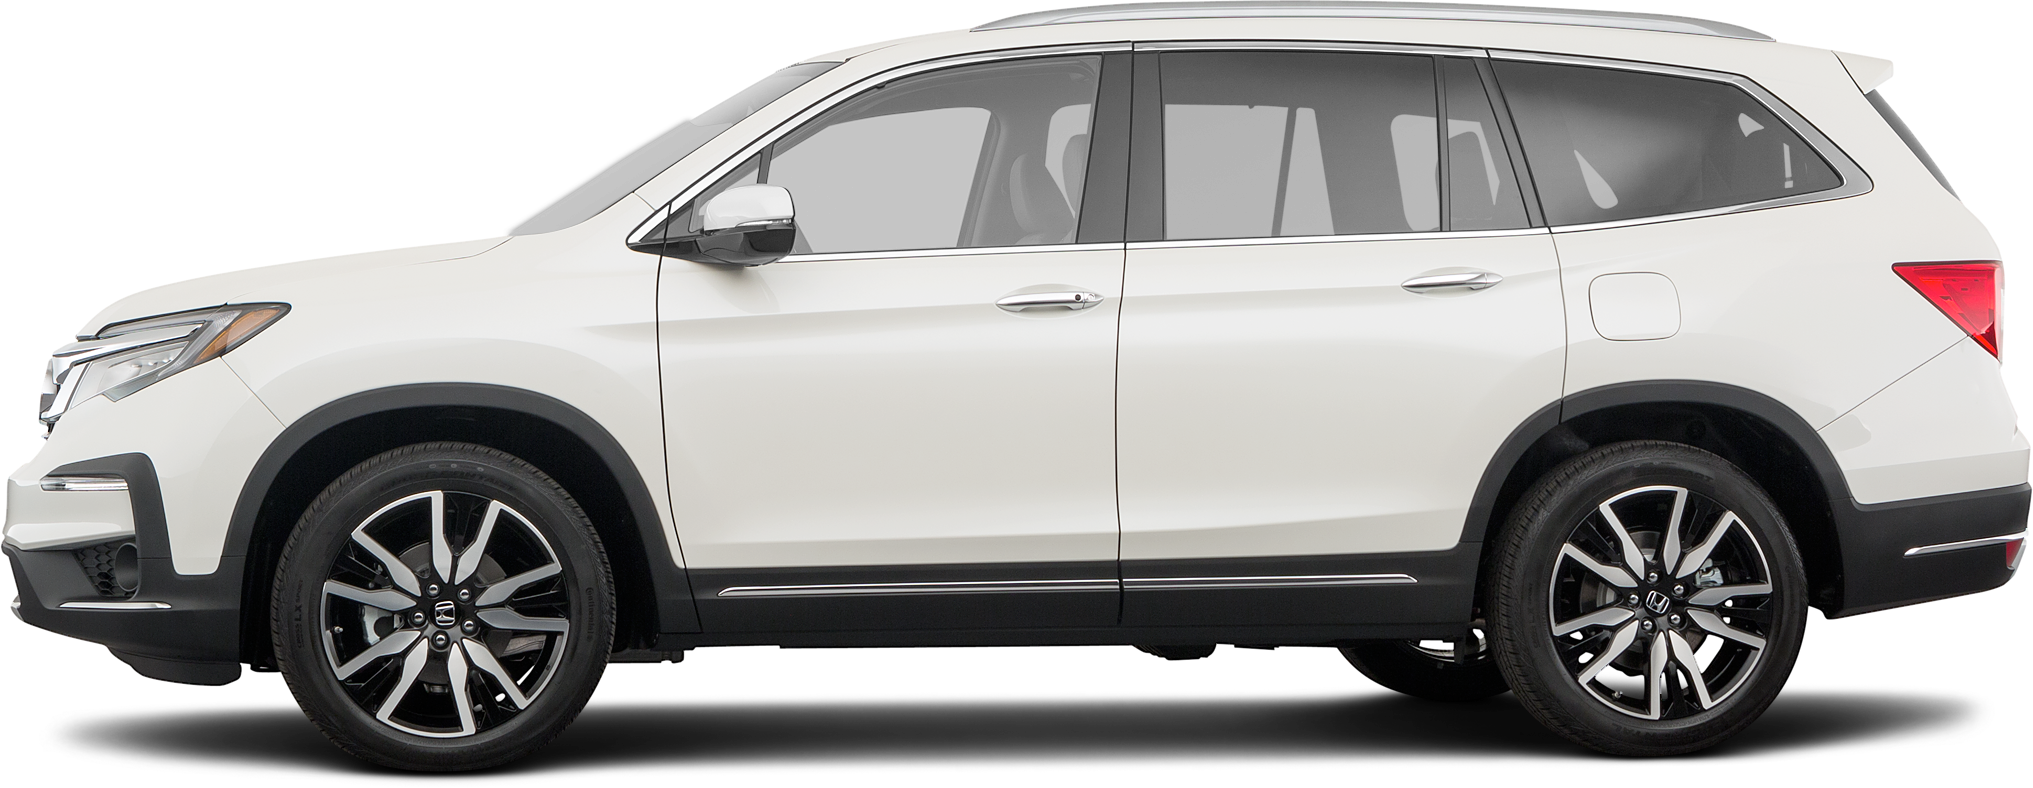 2020 Honda Pilot SUV Touring 8 Passenger FWD